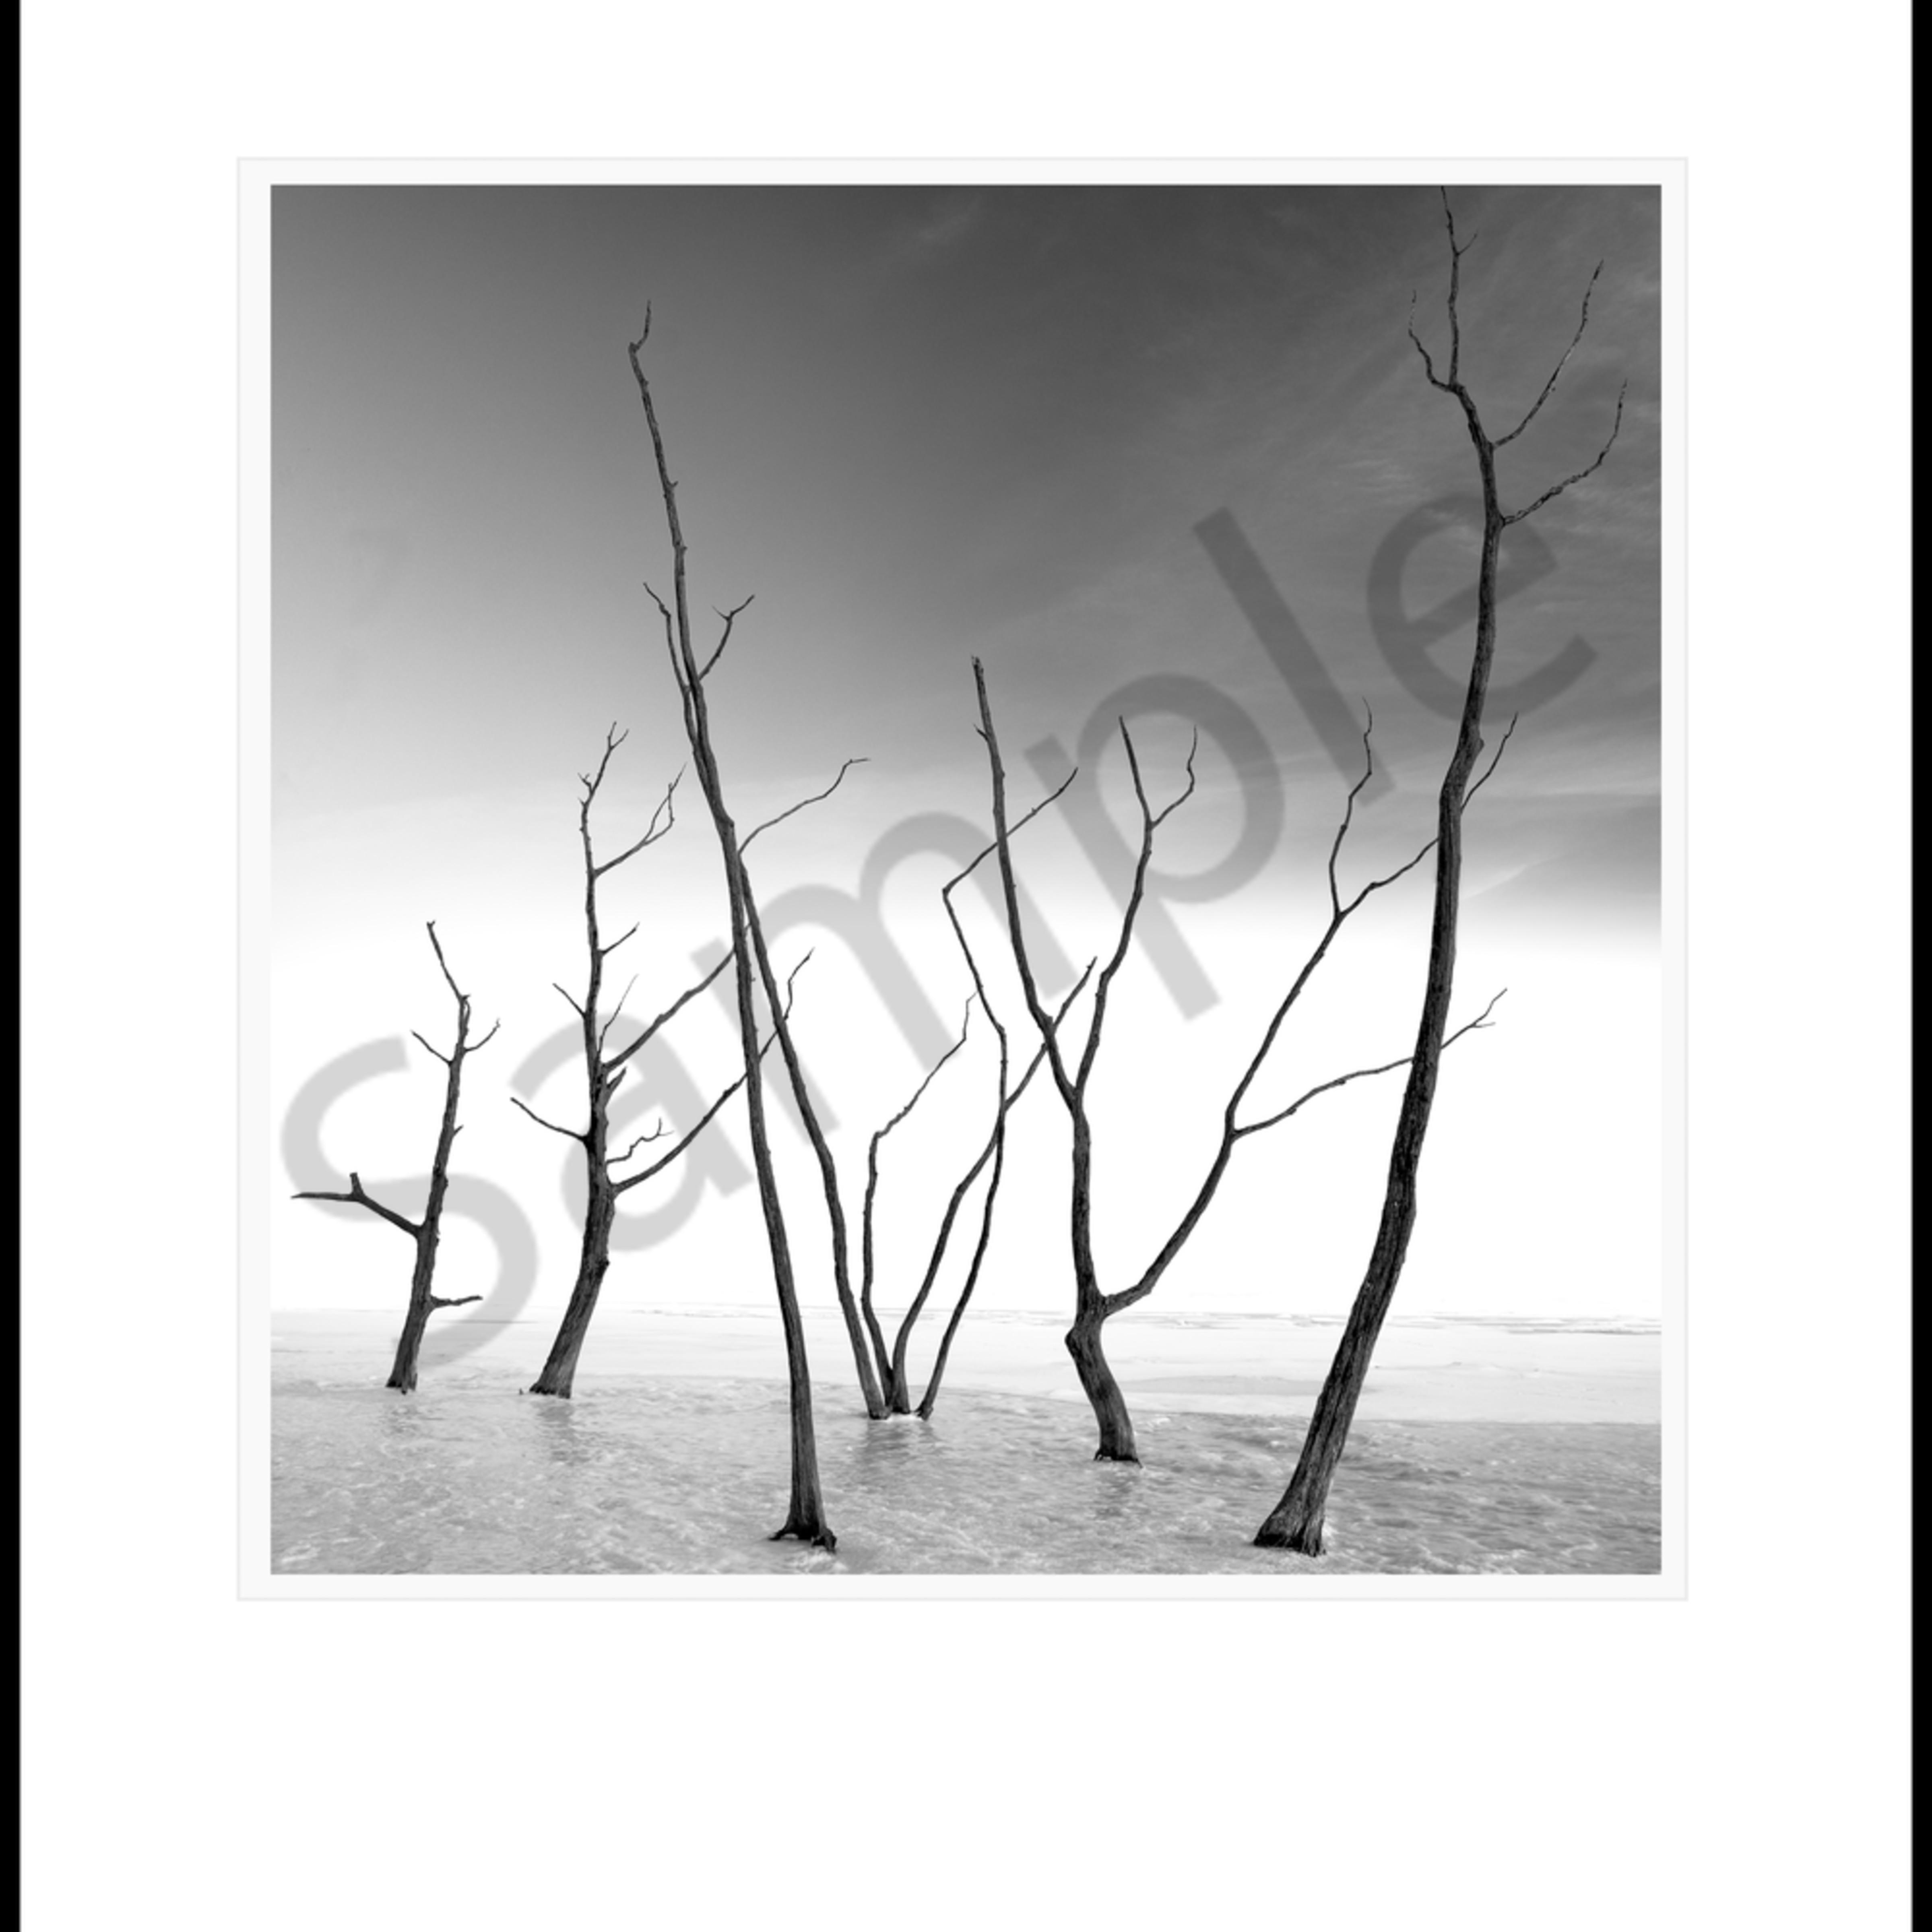 Frozen trees... frozen lake nzpq4q